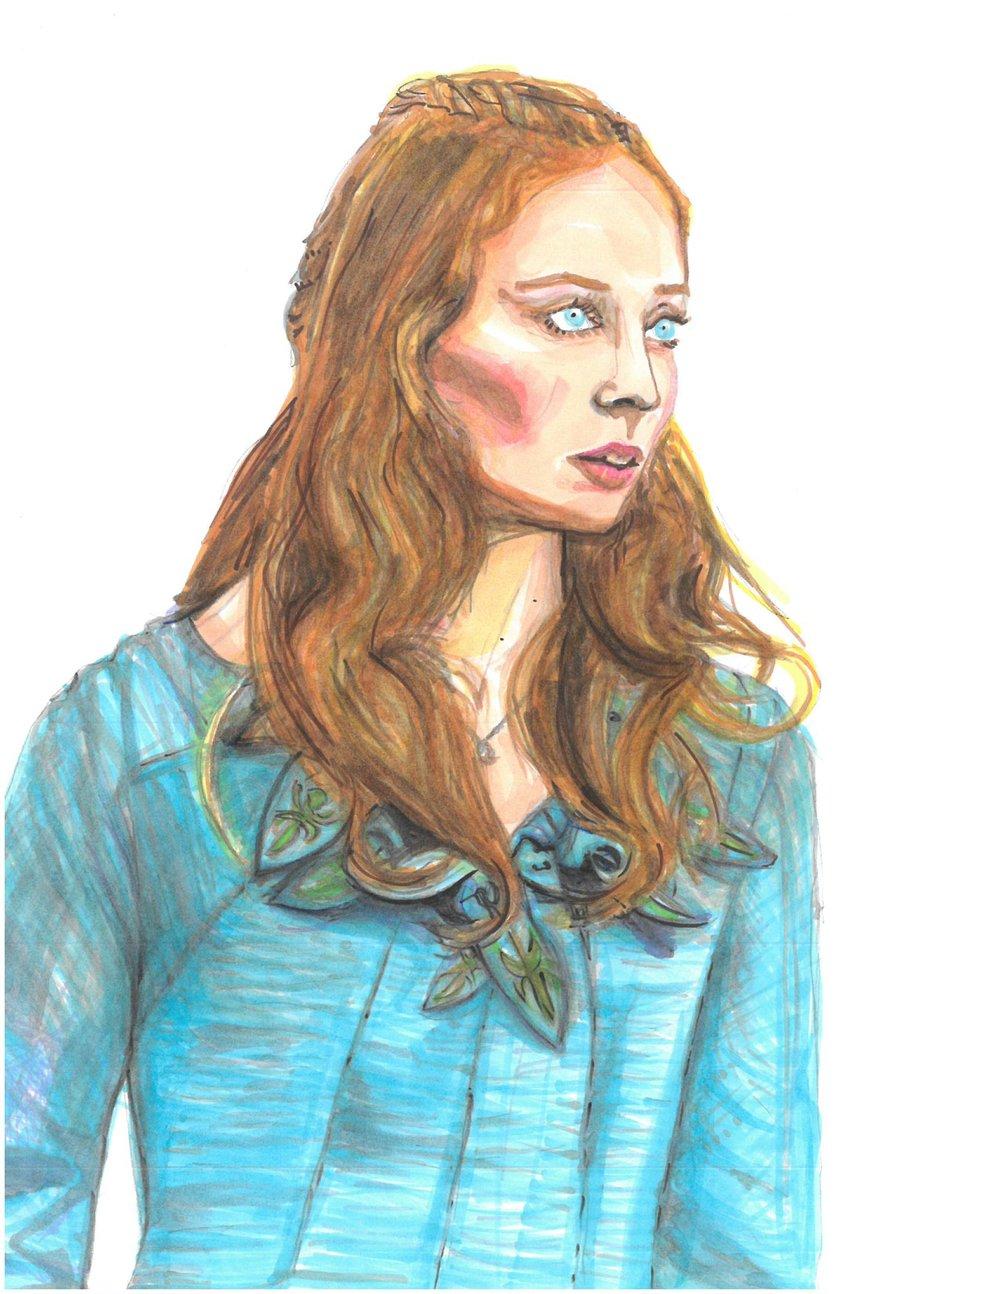 Sophie Turner as Sansa Stark, Season 1 Game of Thrones